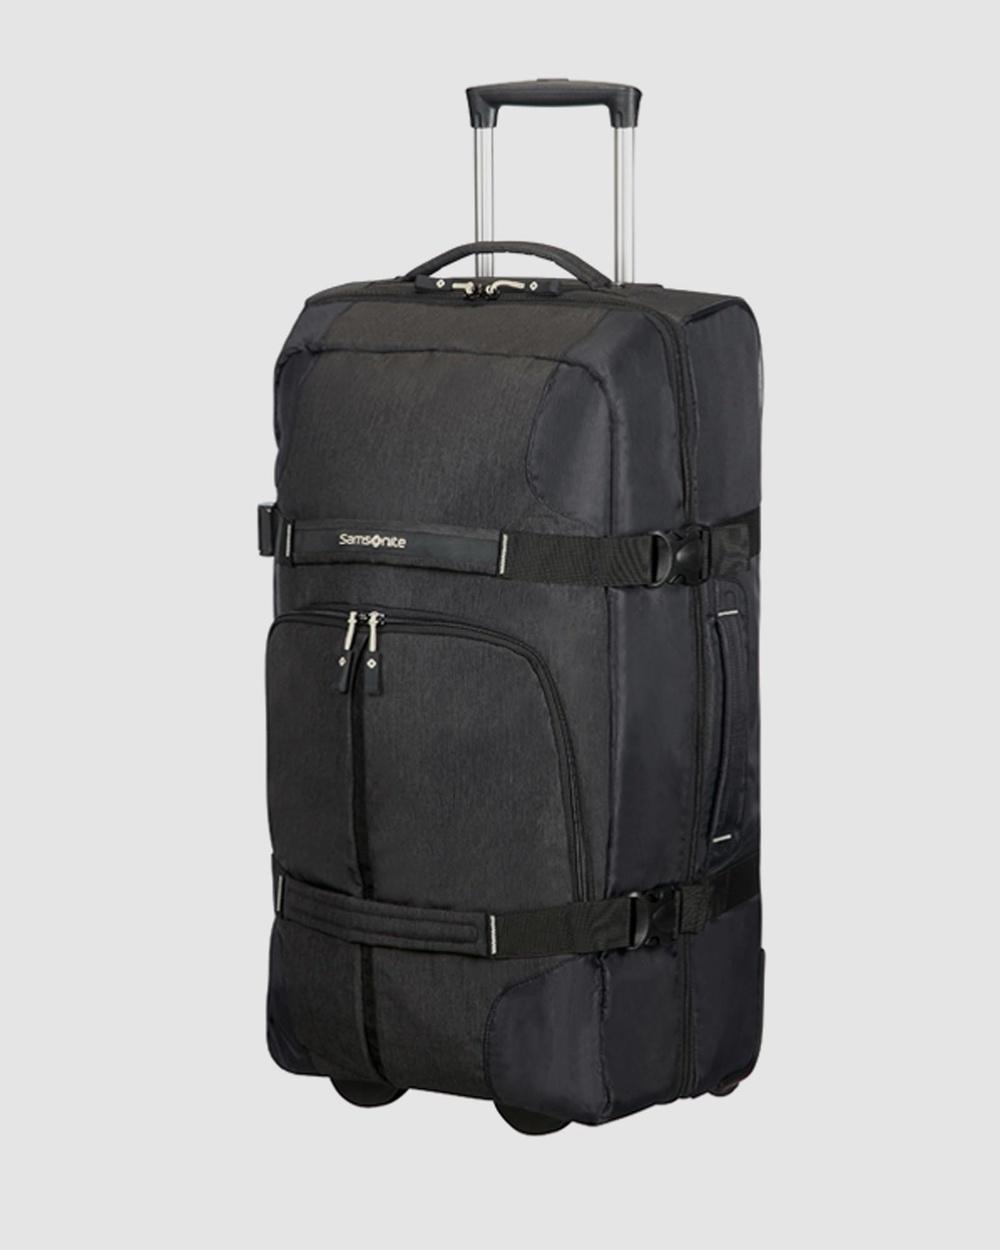 Samsonite Rewind Duffle Wheeled 68cm Bags Black